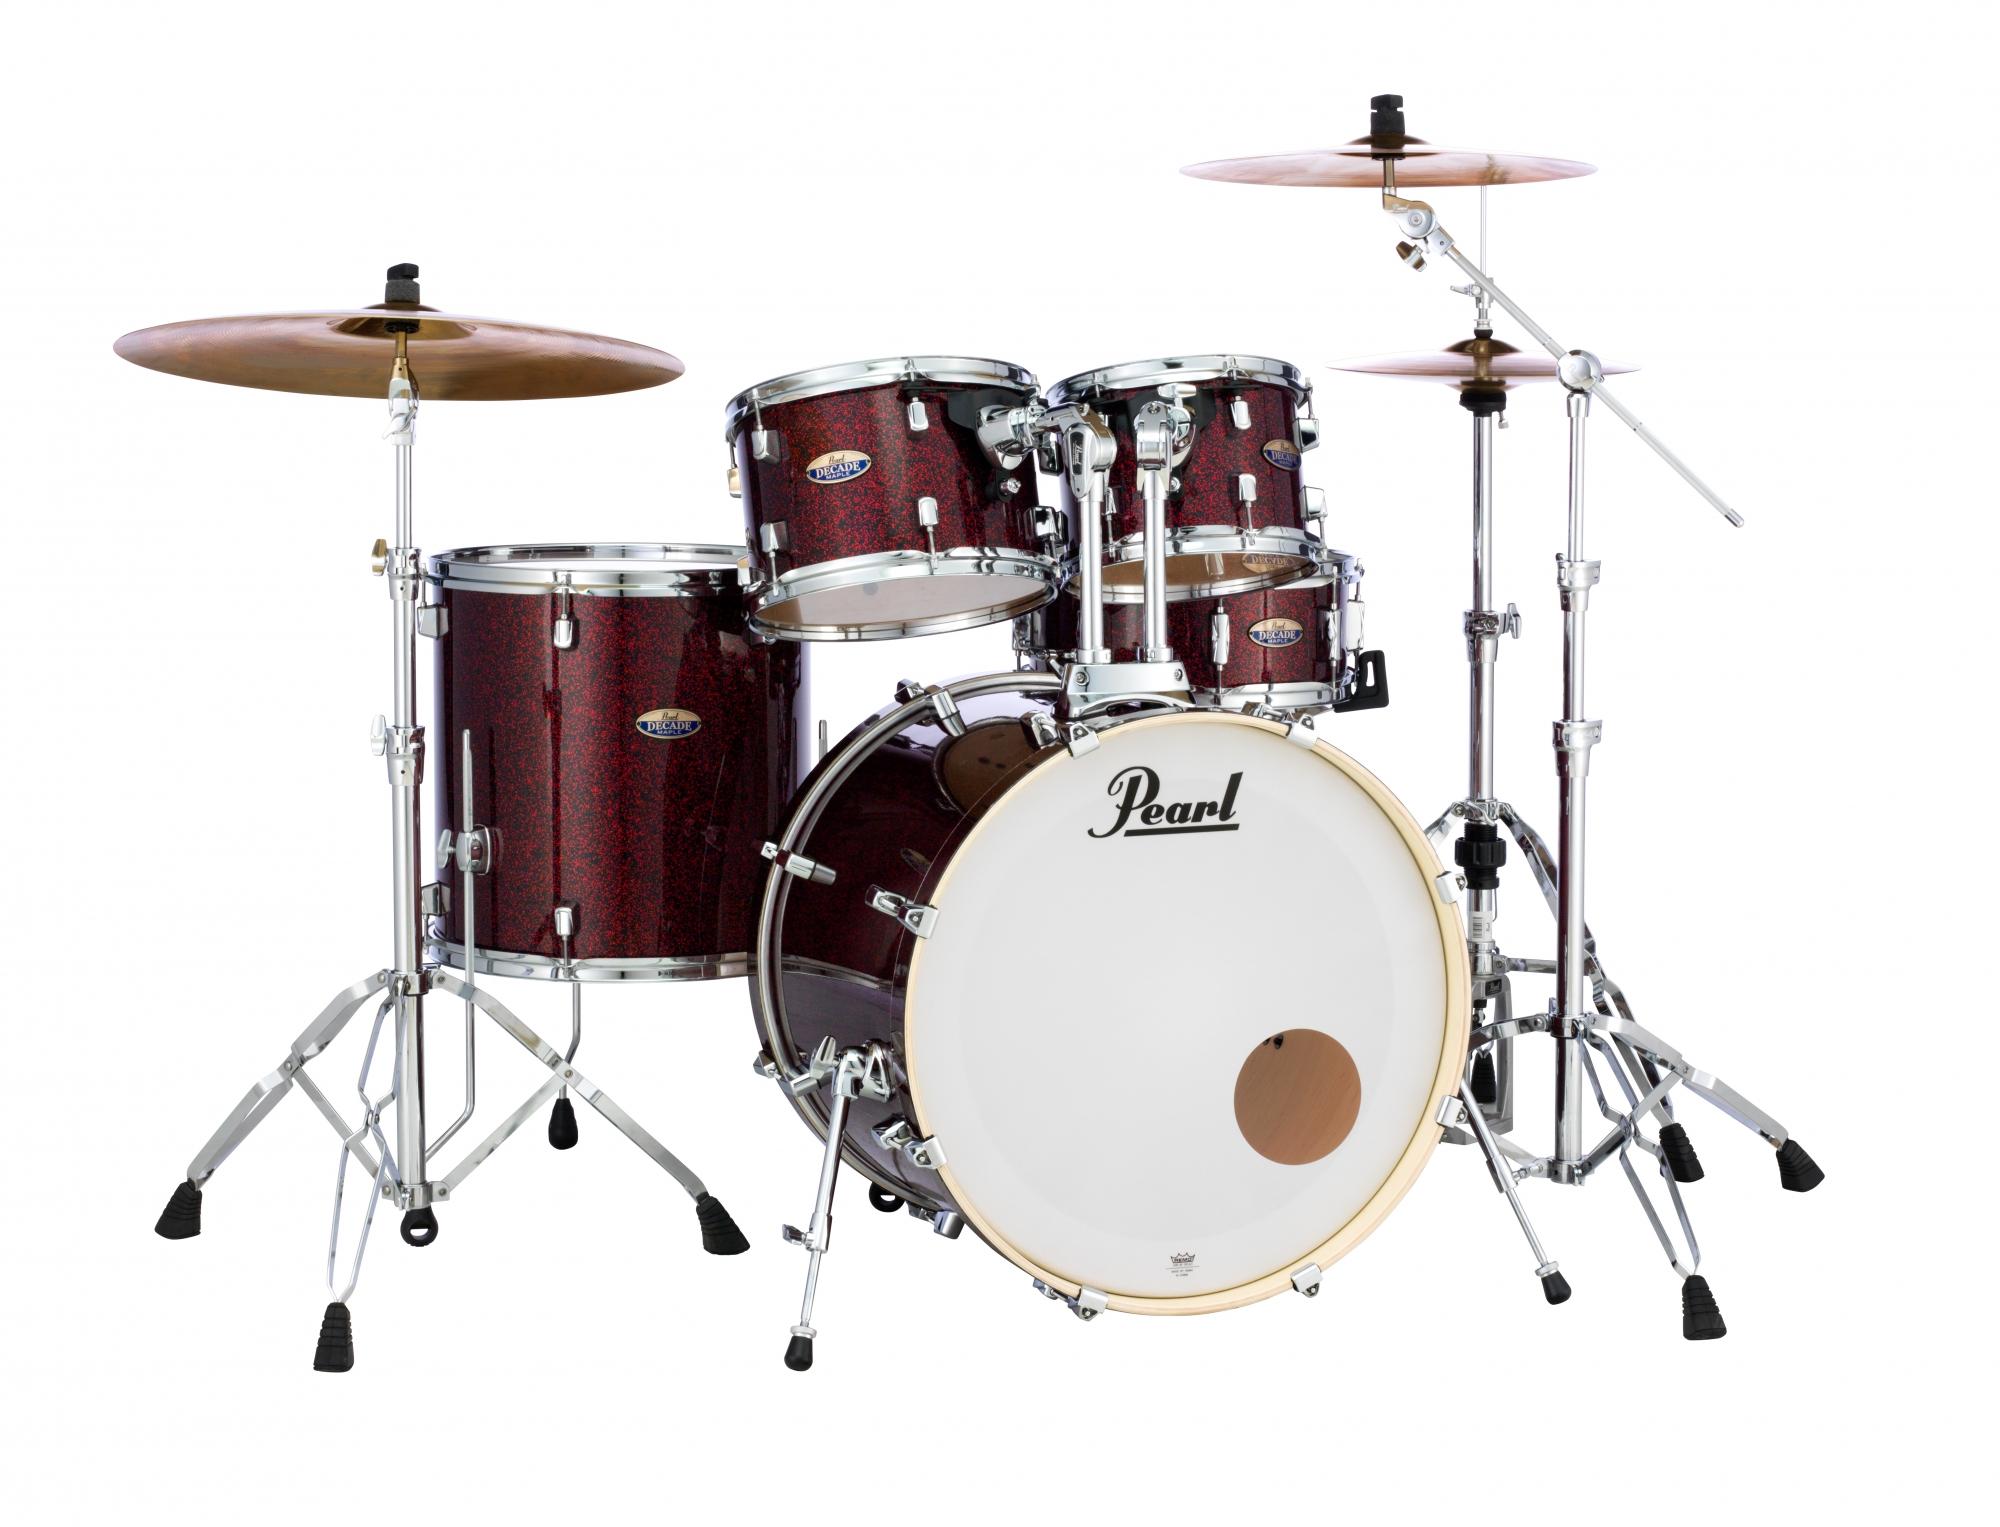 Billede af Pearl Decade Maple Standard Trommesæt Crimson Galaxy Flake